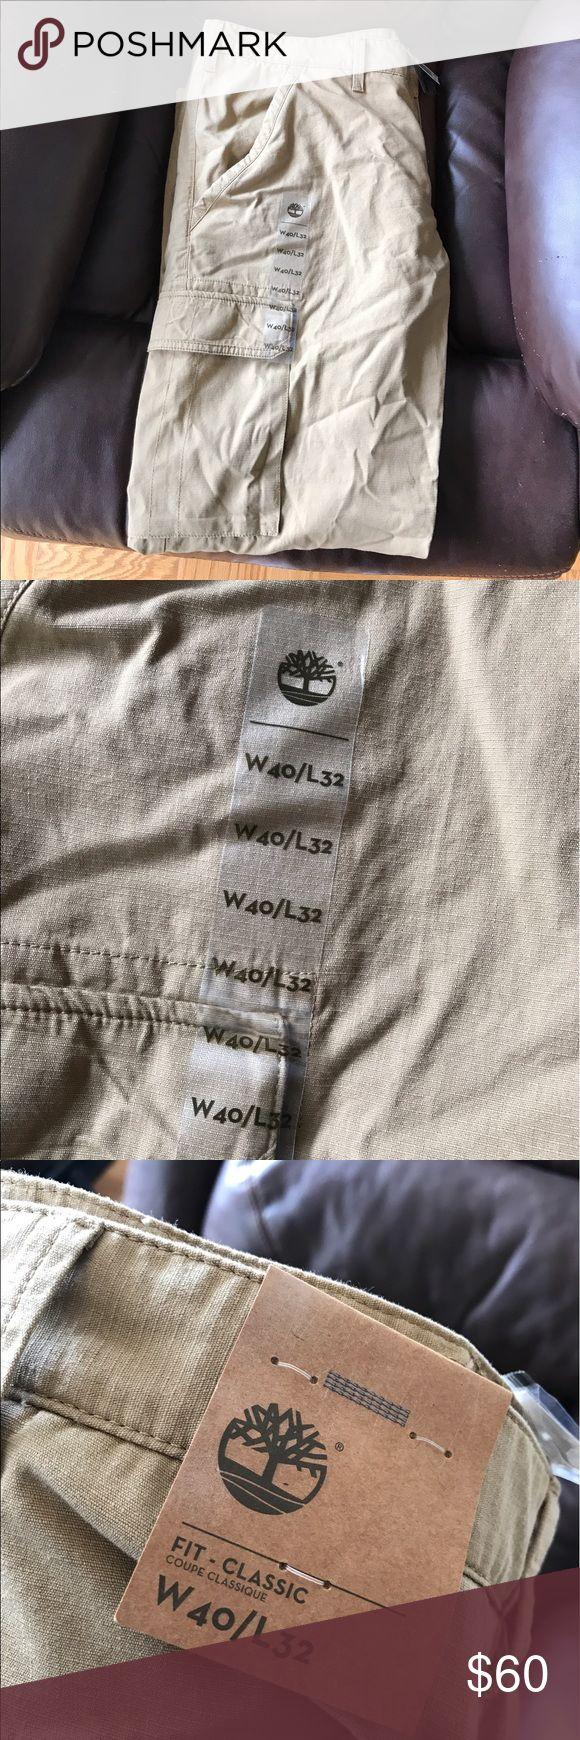 Men's Timberland Khaki Pants NWT Great khaki cargo pants, never worn! Timberland Pants Chinos & Khakis